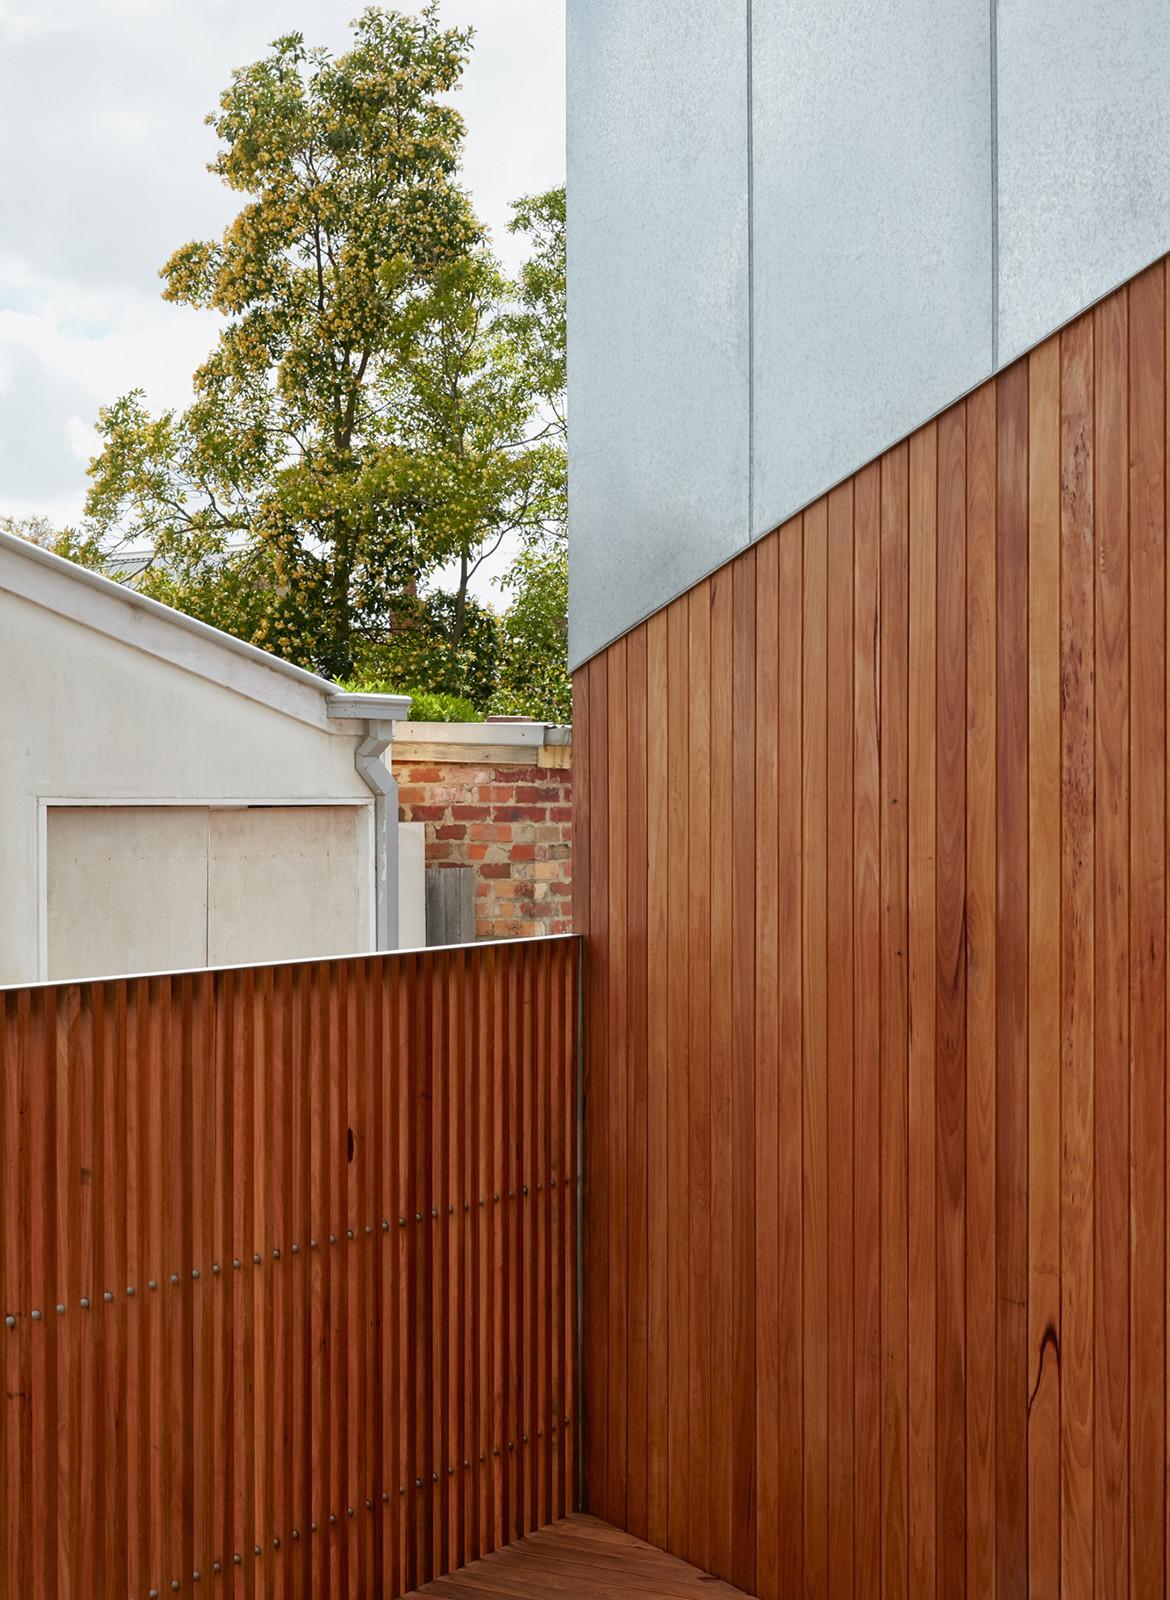 Taranaki Rift House Architecture Architecture front gate